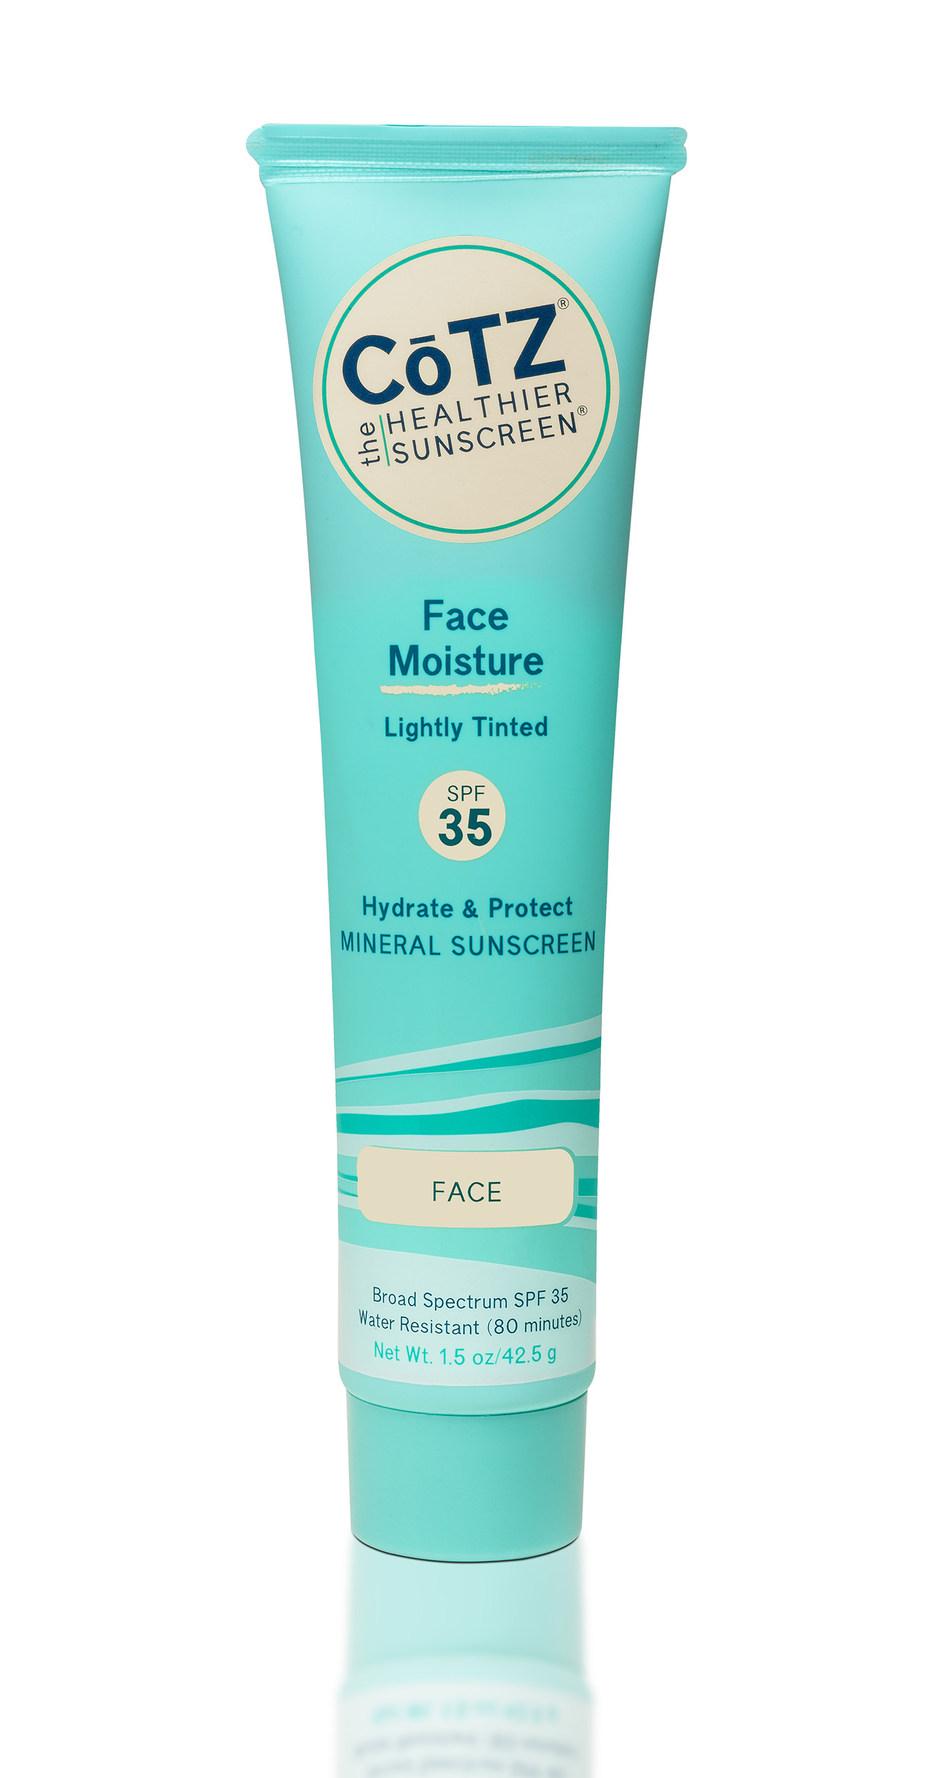 CŌTZ® The Healthier Sunscreen Launches Face Moisture SPF 35